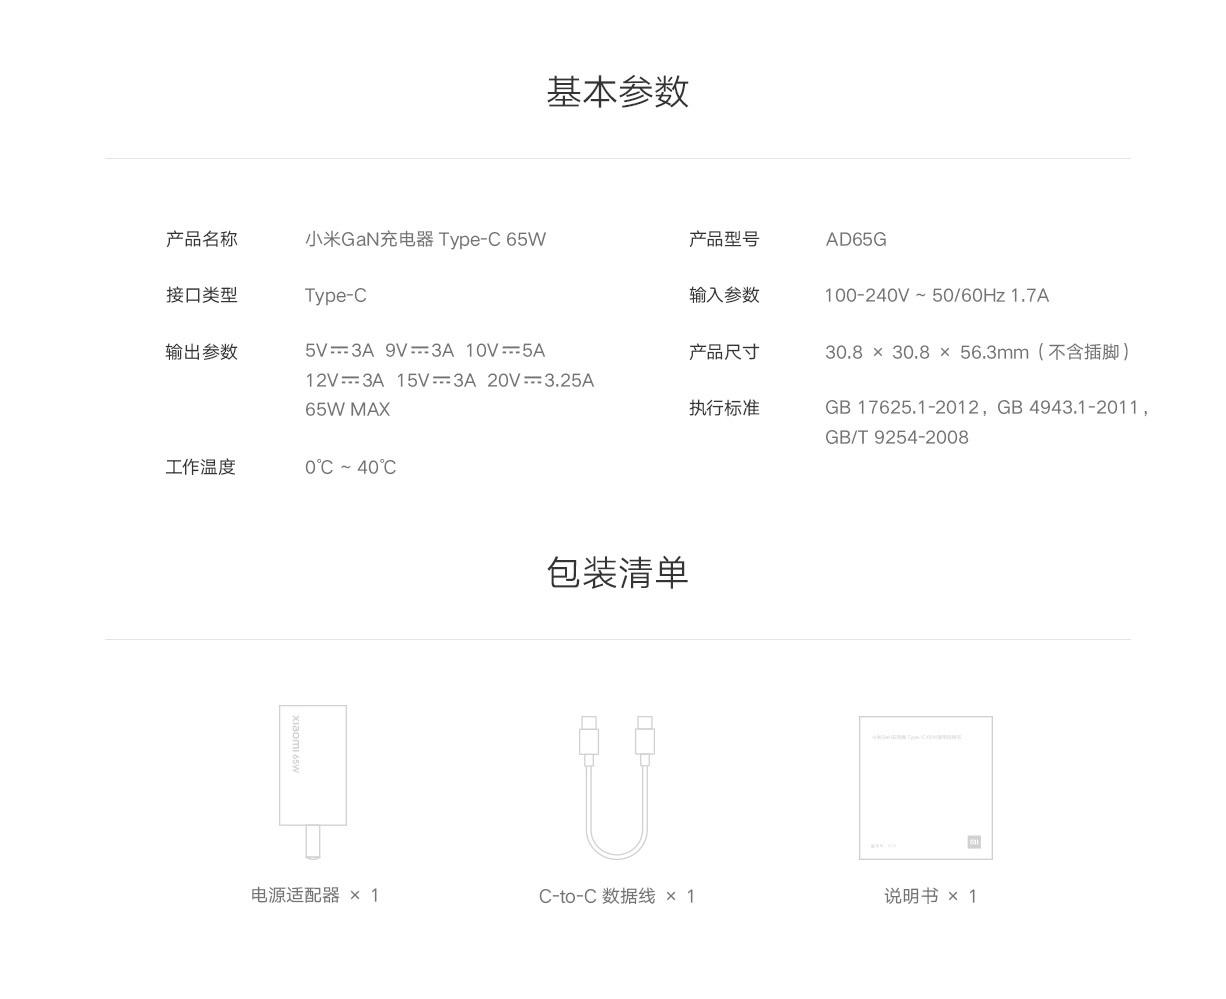 Xiaomi 65W GaN Type-C Fast Charger